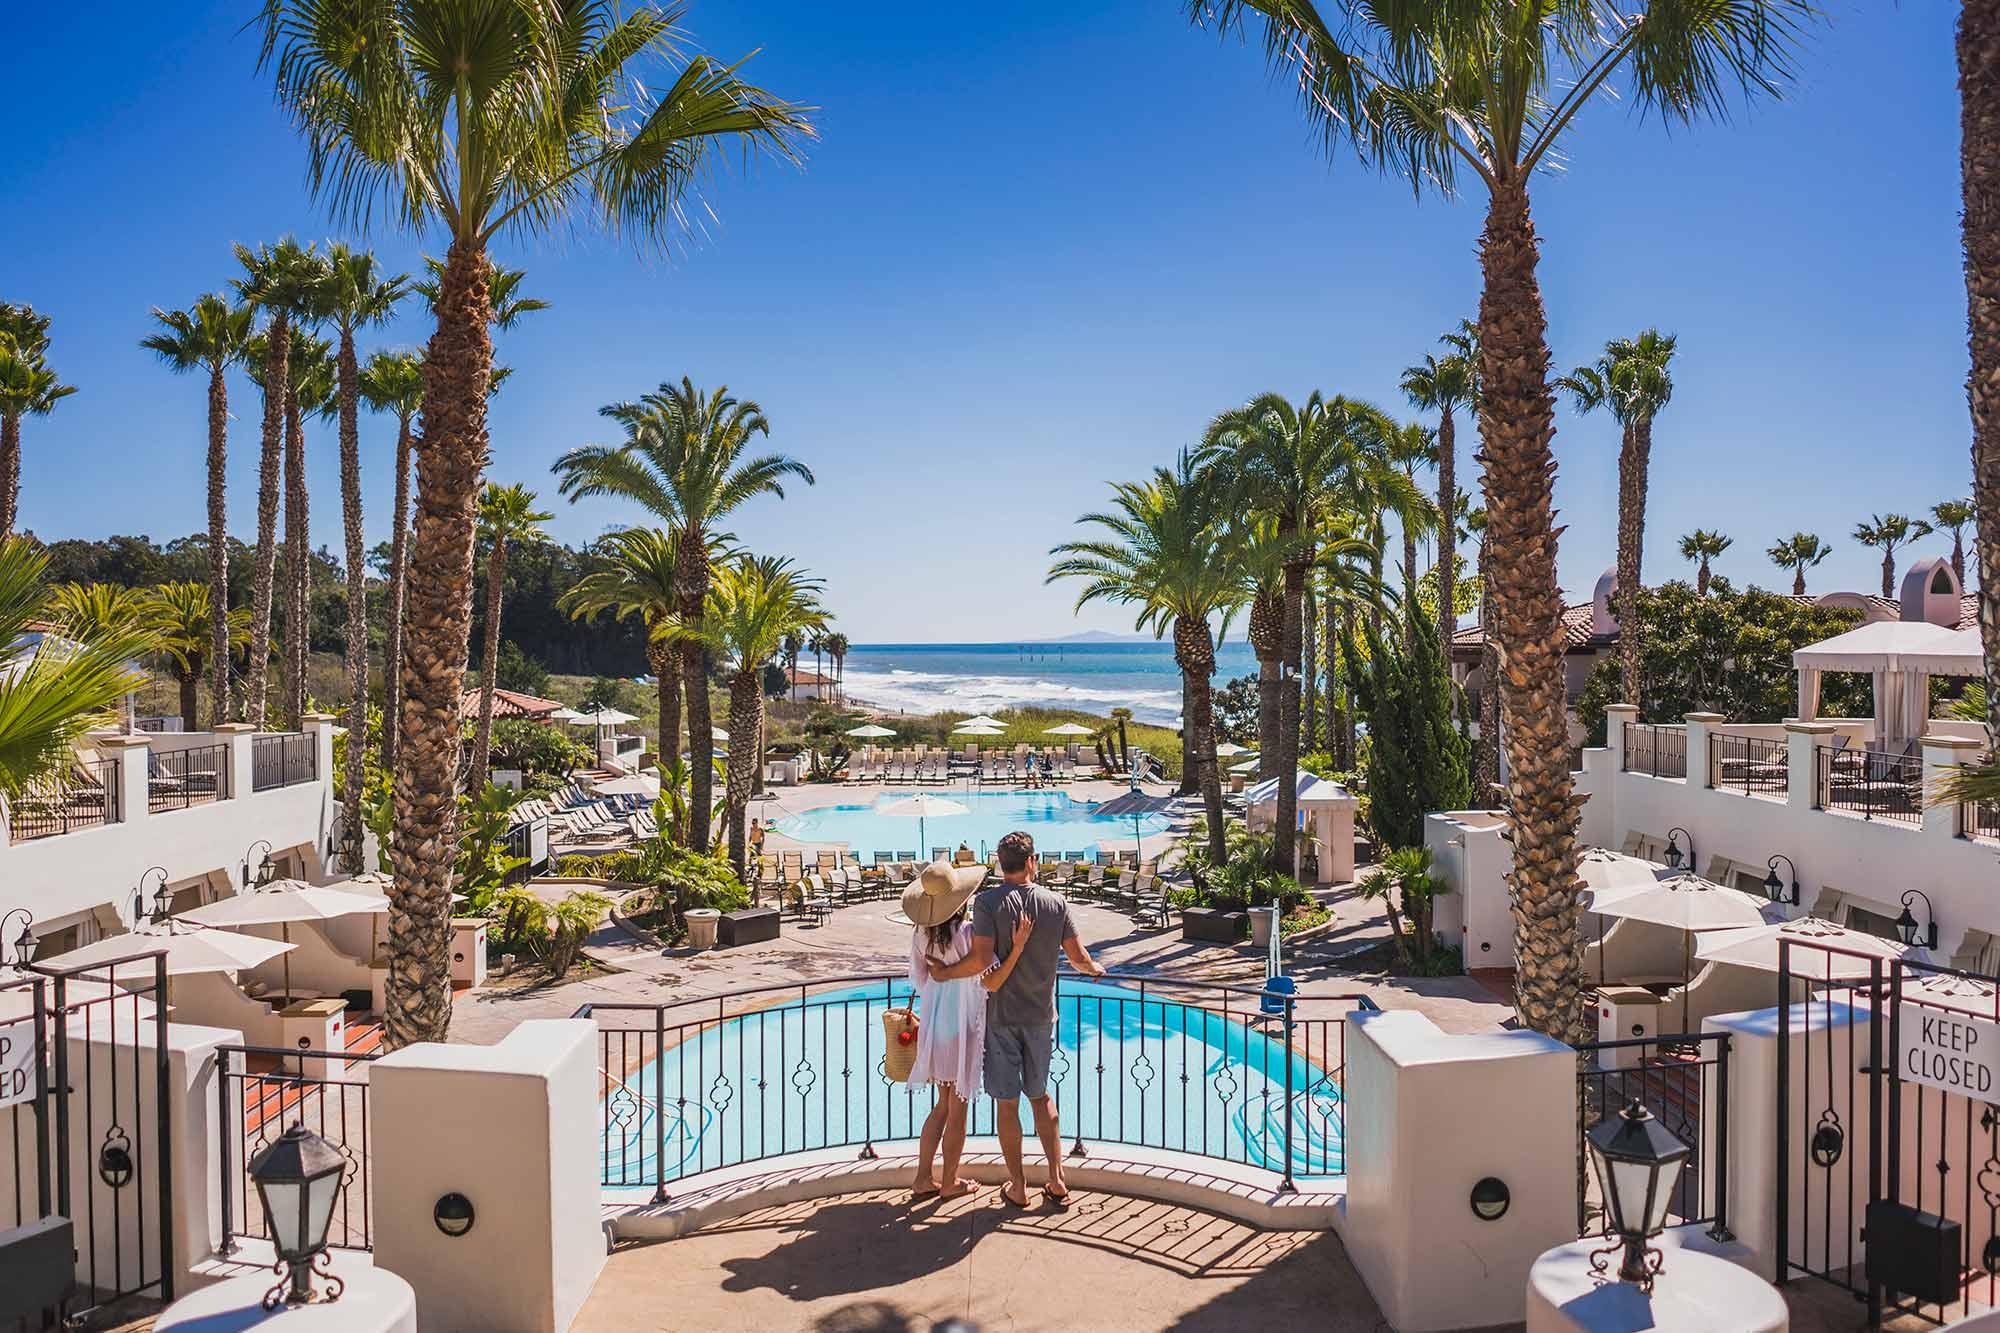 Luxury Hotels In Santa Barbara Visit Santa Barbara